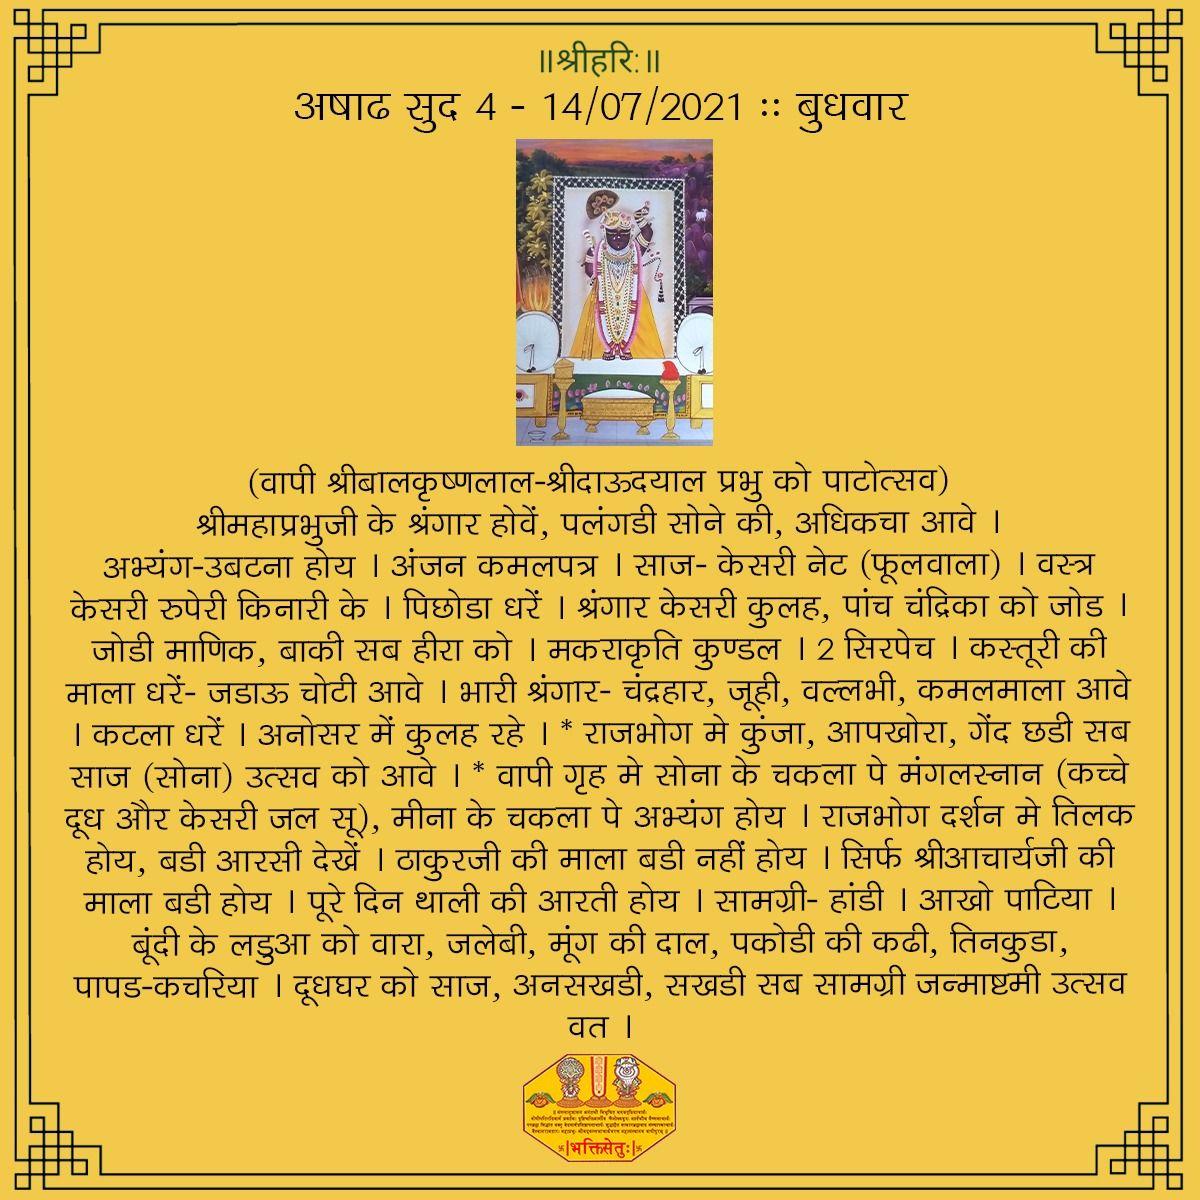 Ashadh Sud 4 :: Wednesday